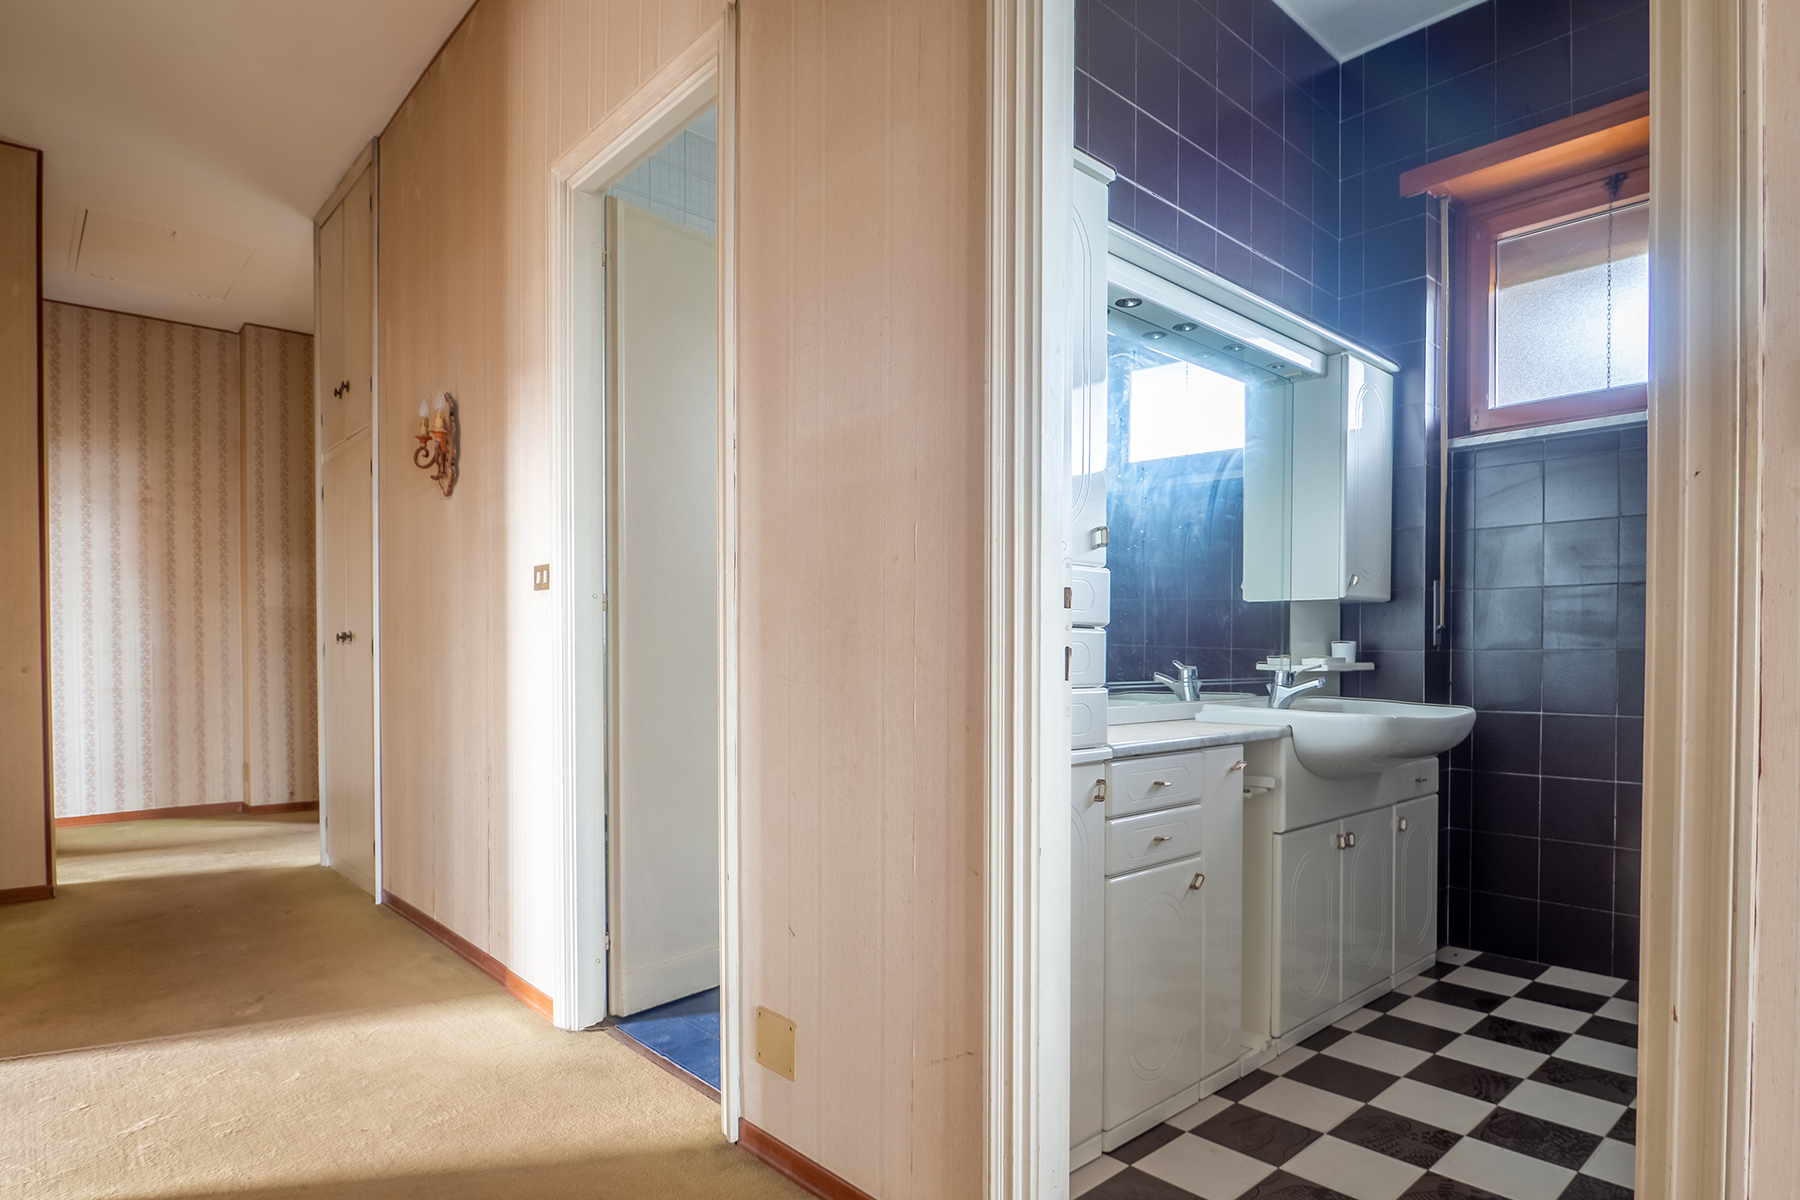 Casa indipendente in Vendita a Torino: 5 locali, 277 mq - Foto 9